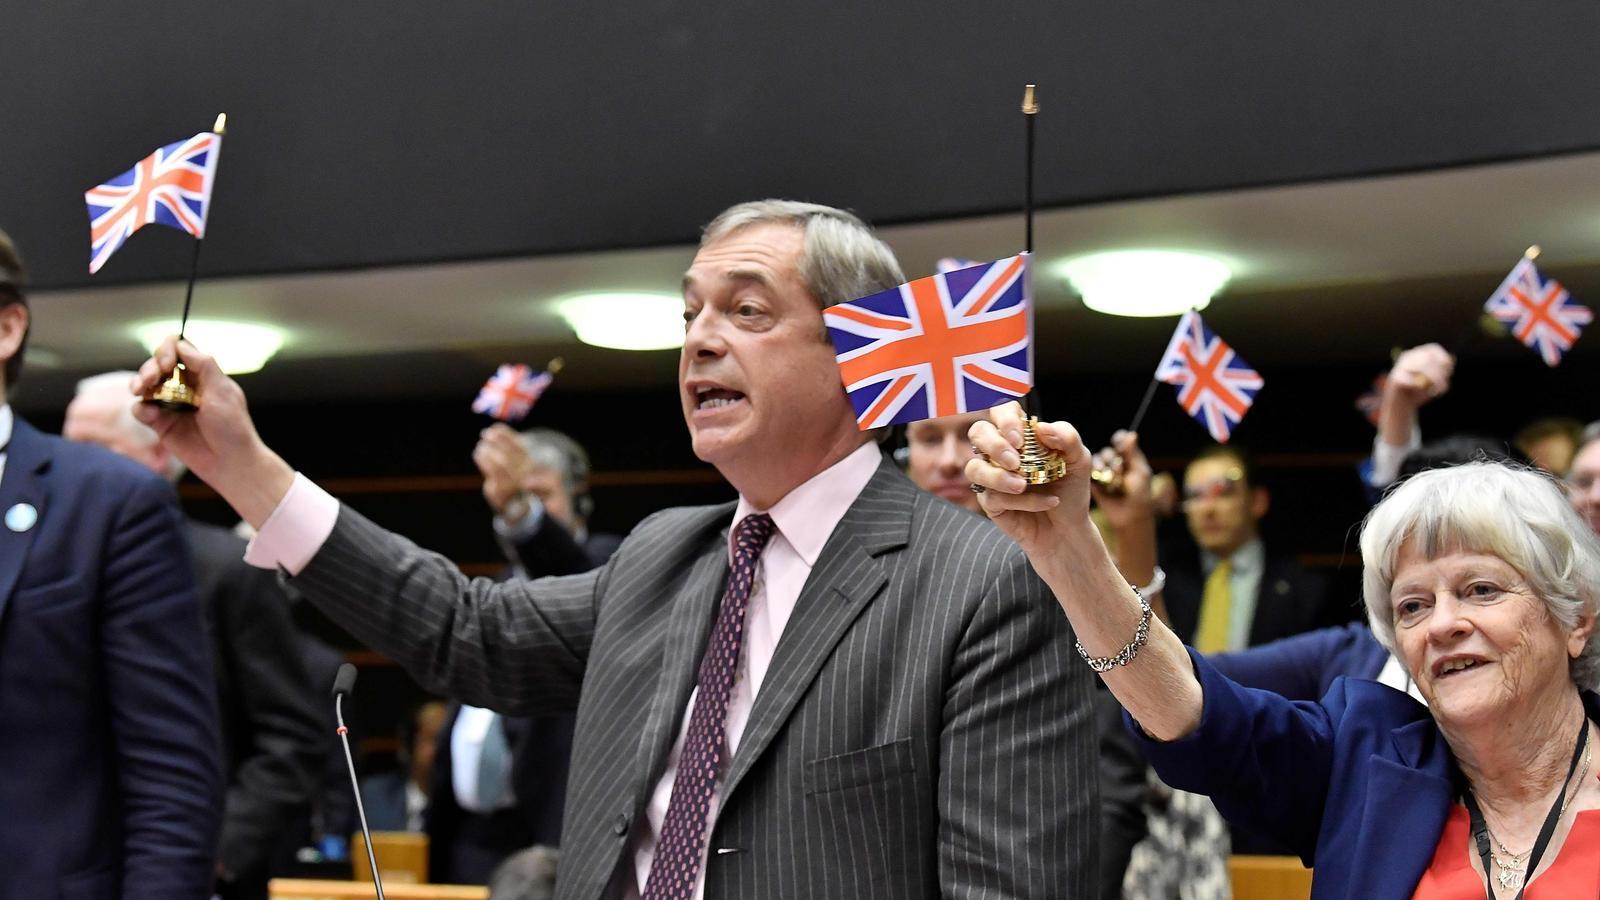 Nigel Farage aquest matí a Brussel·les